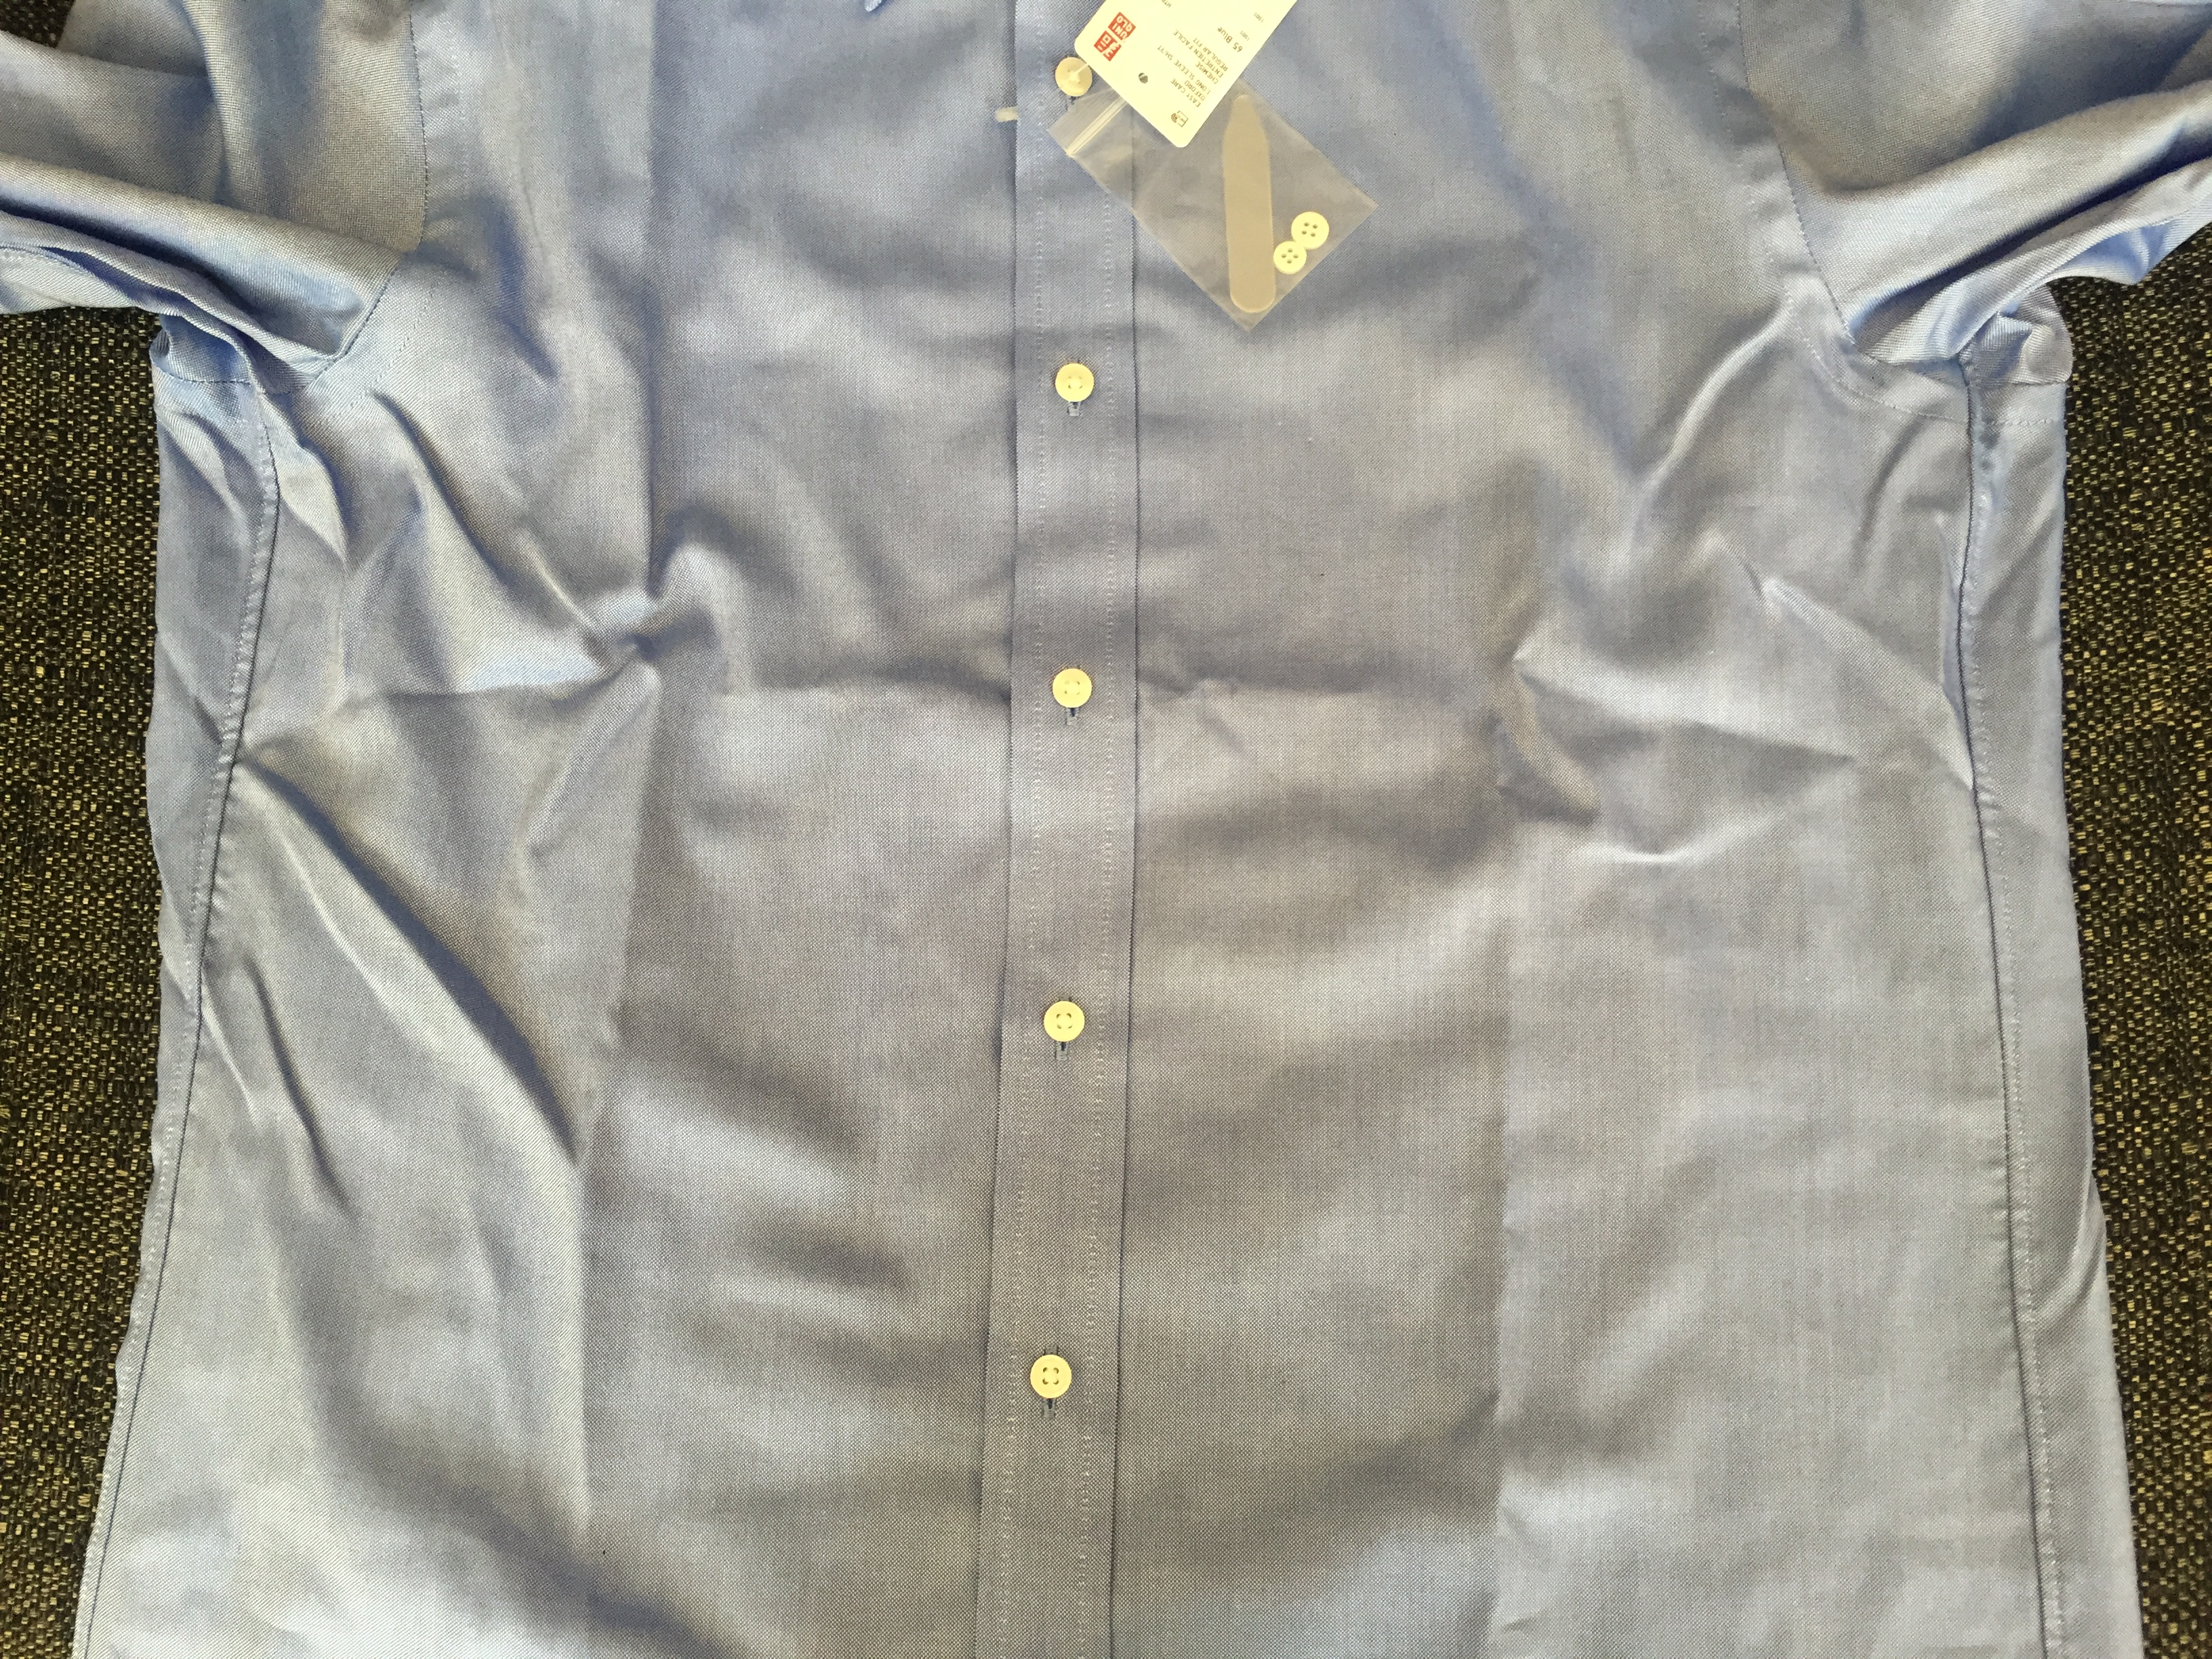 Uniqlo Stretch Slim Fit - Shirt Fit Guide